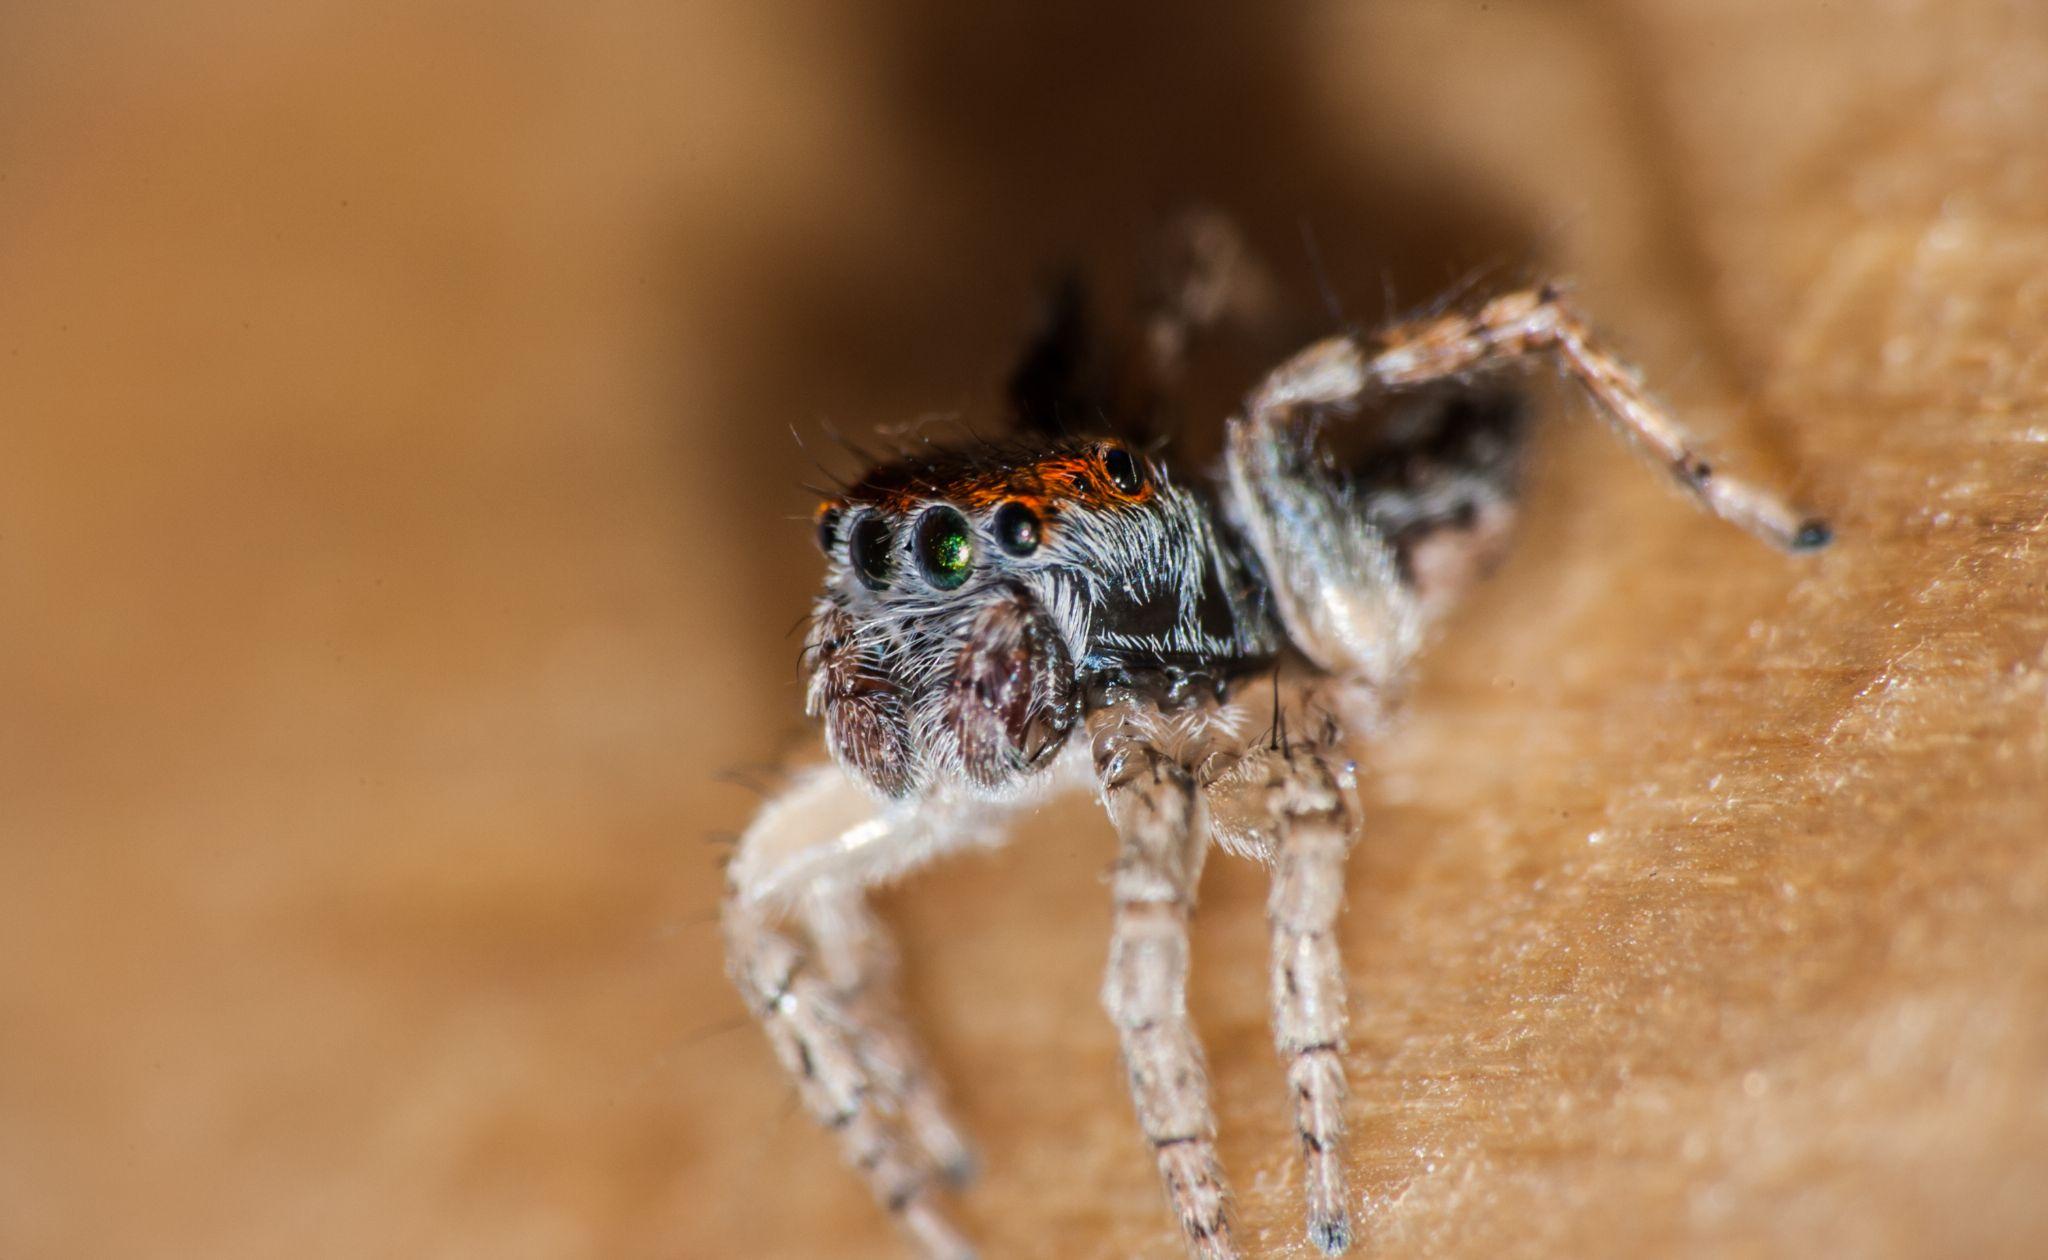 Spider. by Fabien Violi